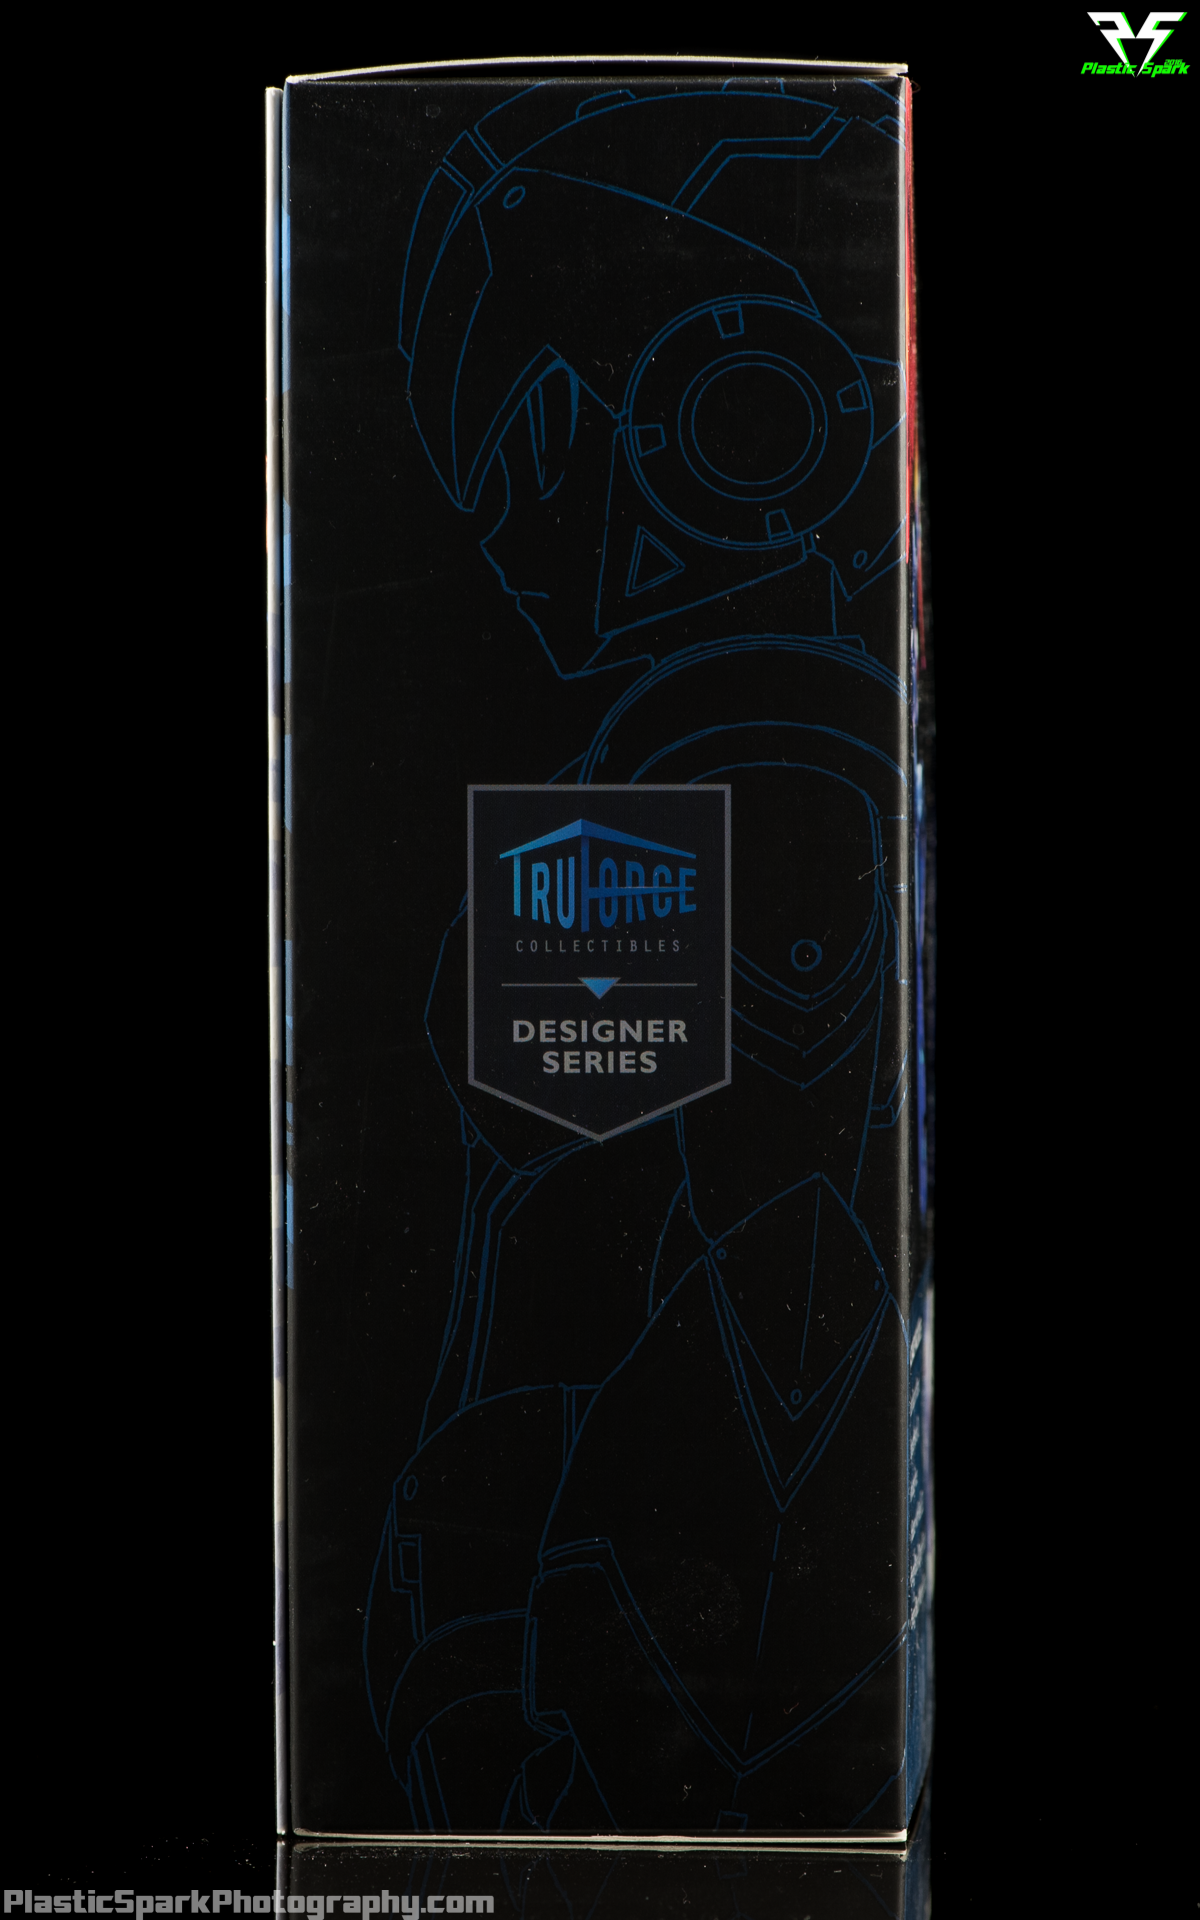 Truforce-Megaman-X-Packaging-(4-of-6).png